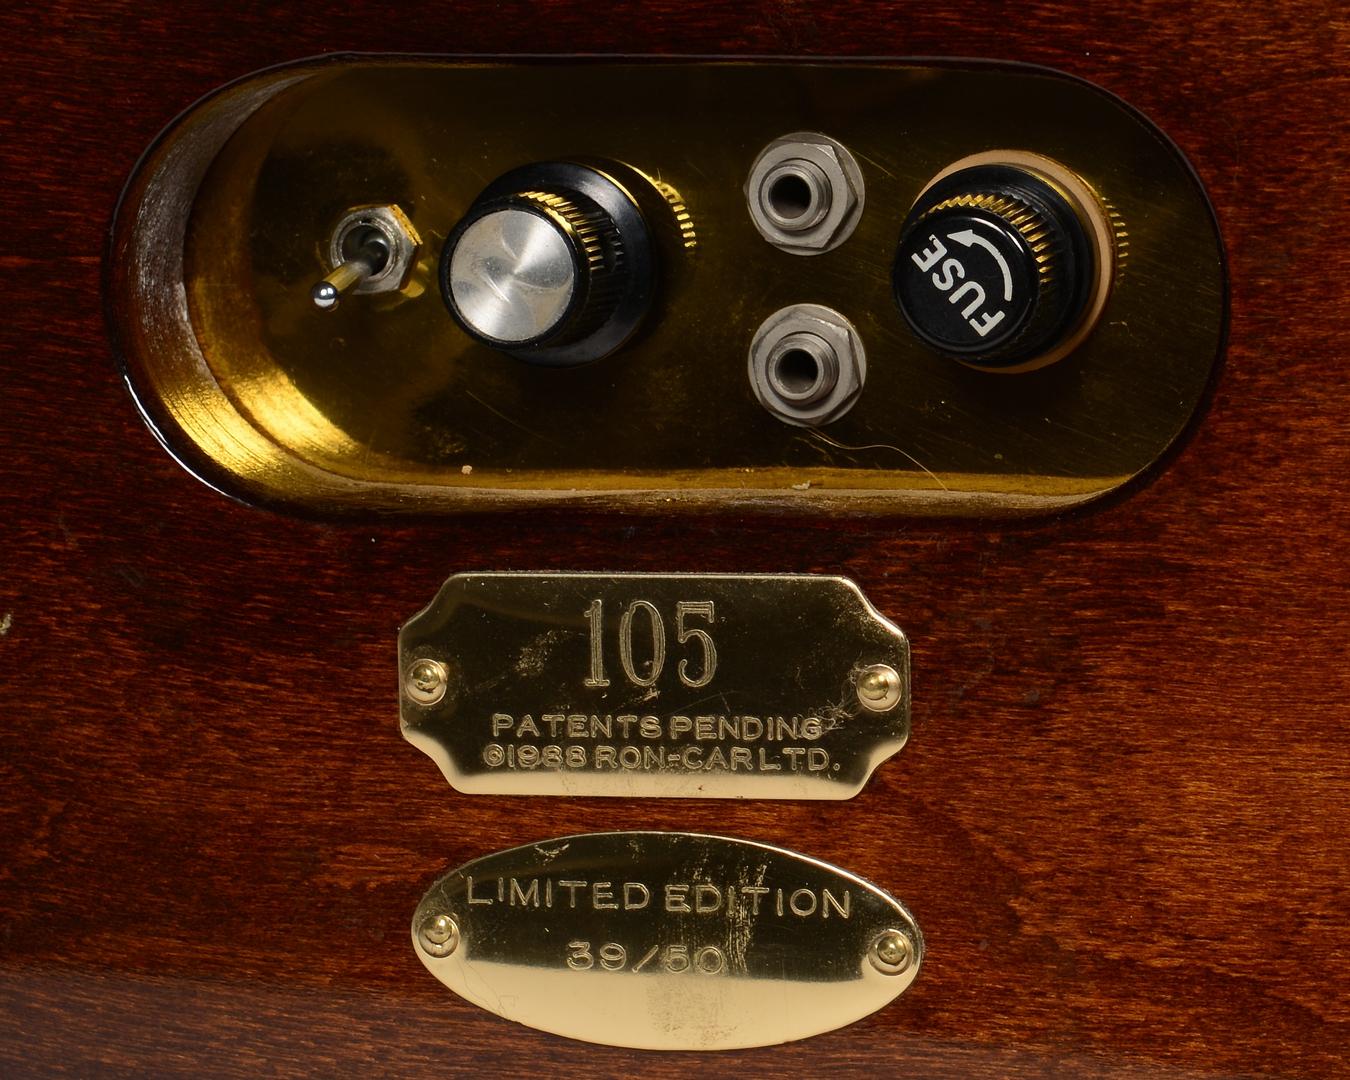 Lot 647: Limited Edition John-Paul Carousel